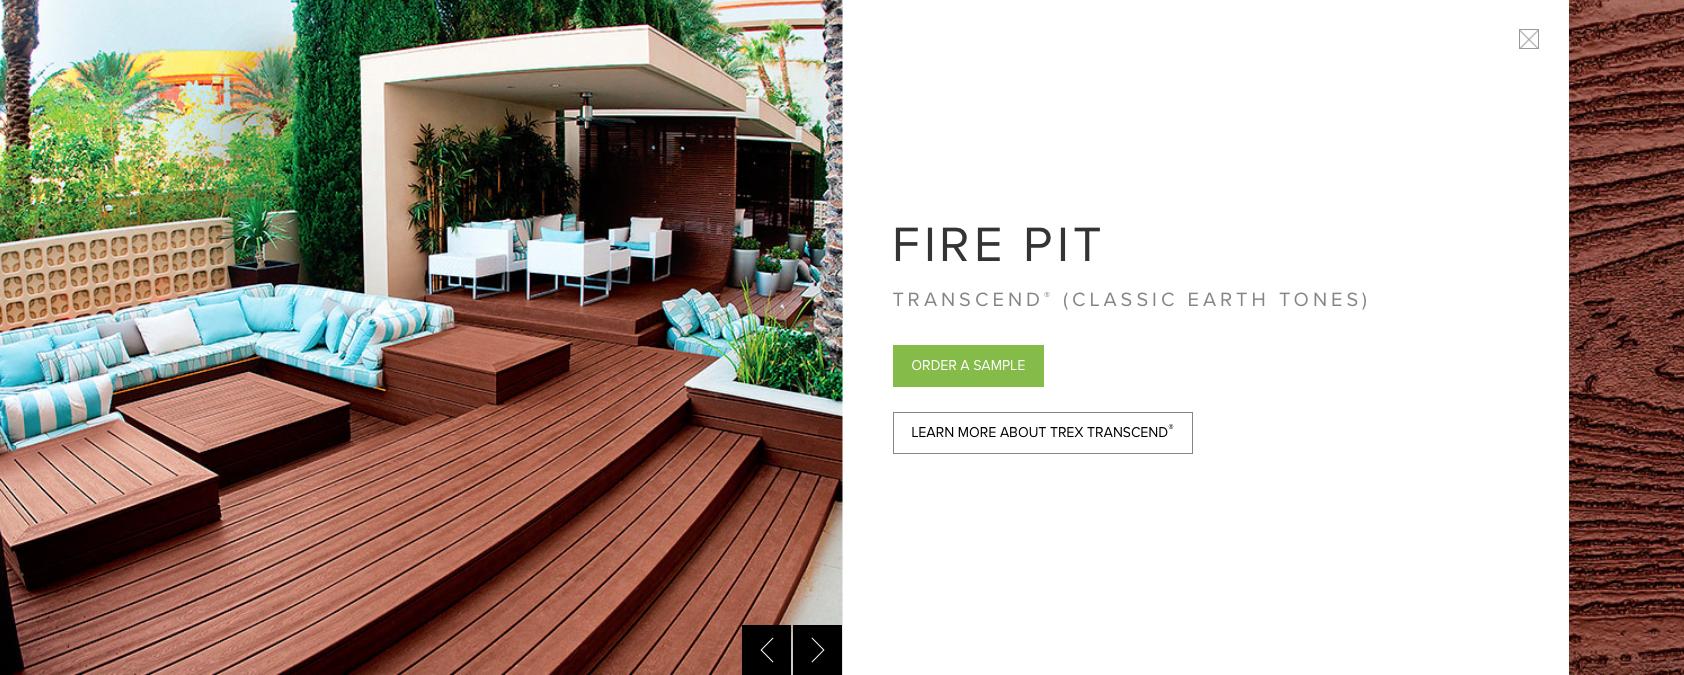 Trex Transcend (Classic Earth Tones) Fire Pit